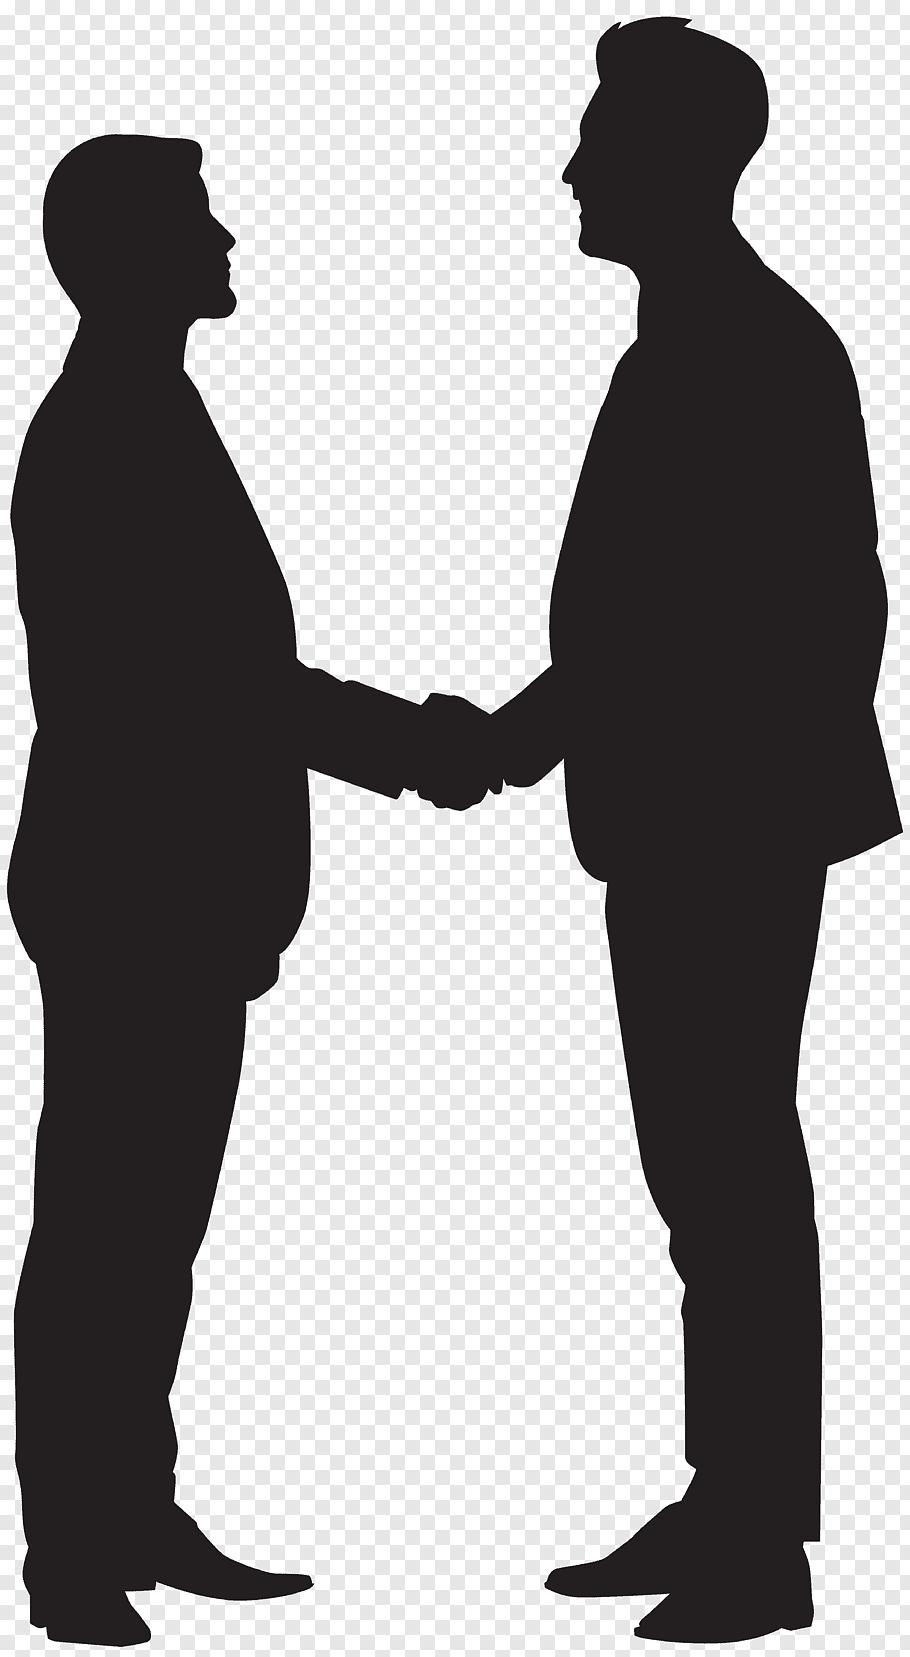 Two man shaking hand, Silhouette Handshake, Men Shaking.